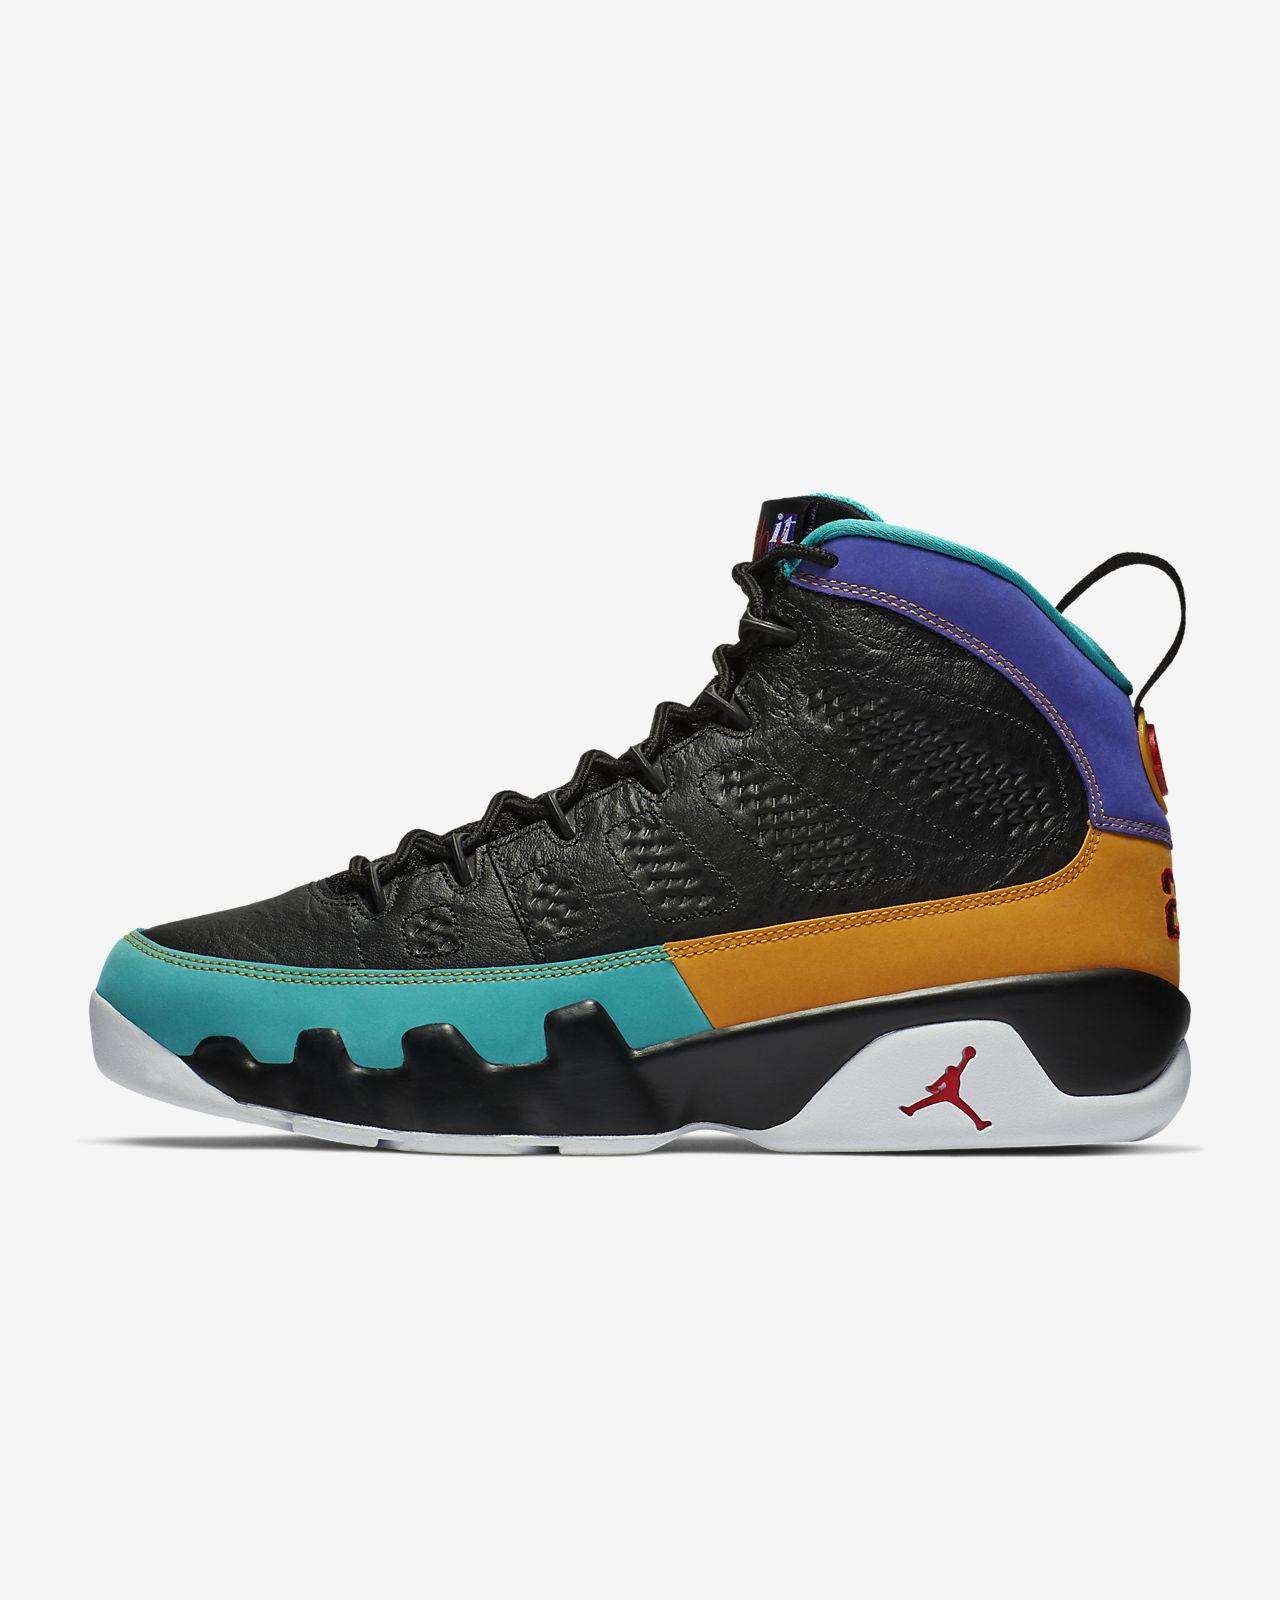 b6bc166700b5 Air Jordan 9 Retro Men s Shoe. Nike.com ZA